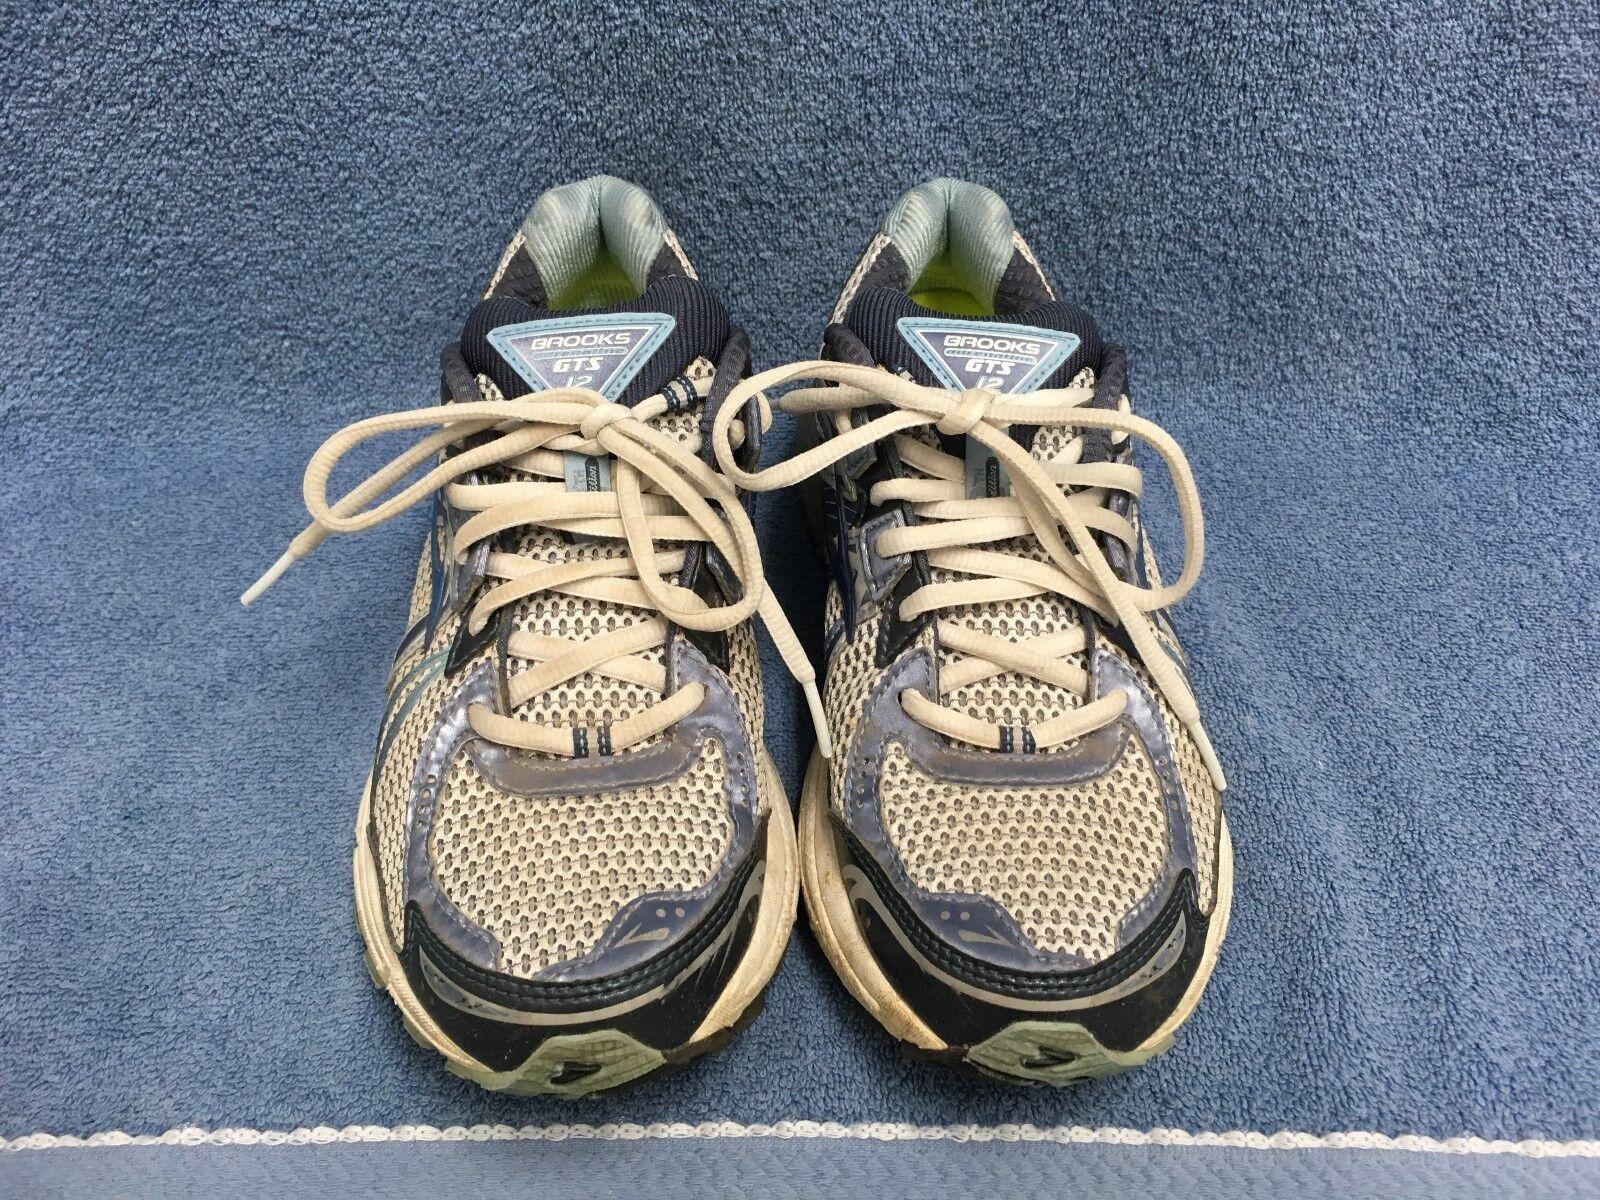 BROOKS ADRENALINE GTS 12 Womens Blue/Gray Running Shoes Size 9.5 Narrow (2A) GUC